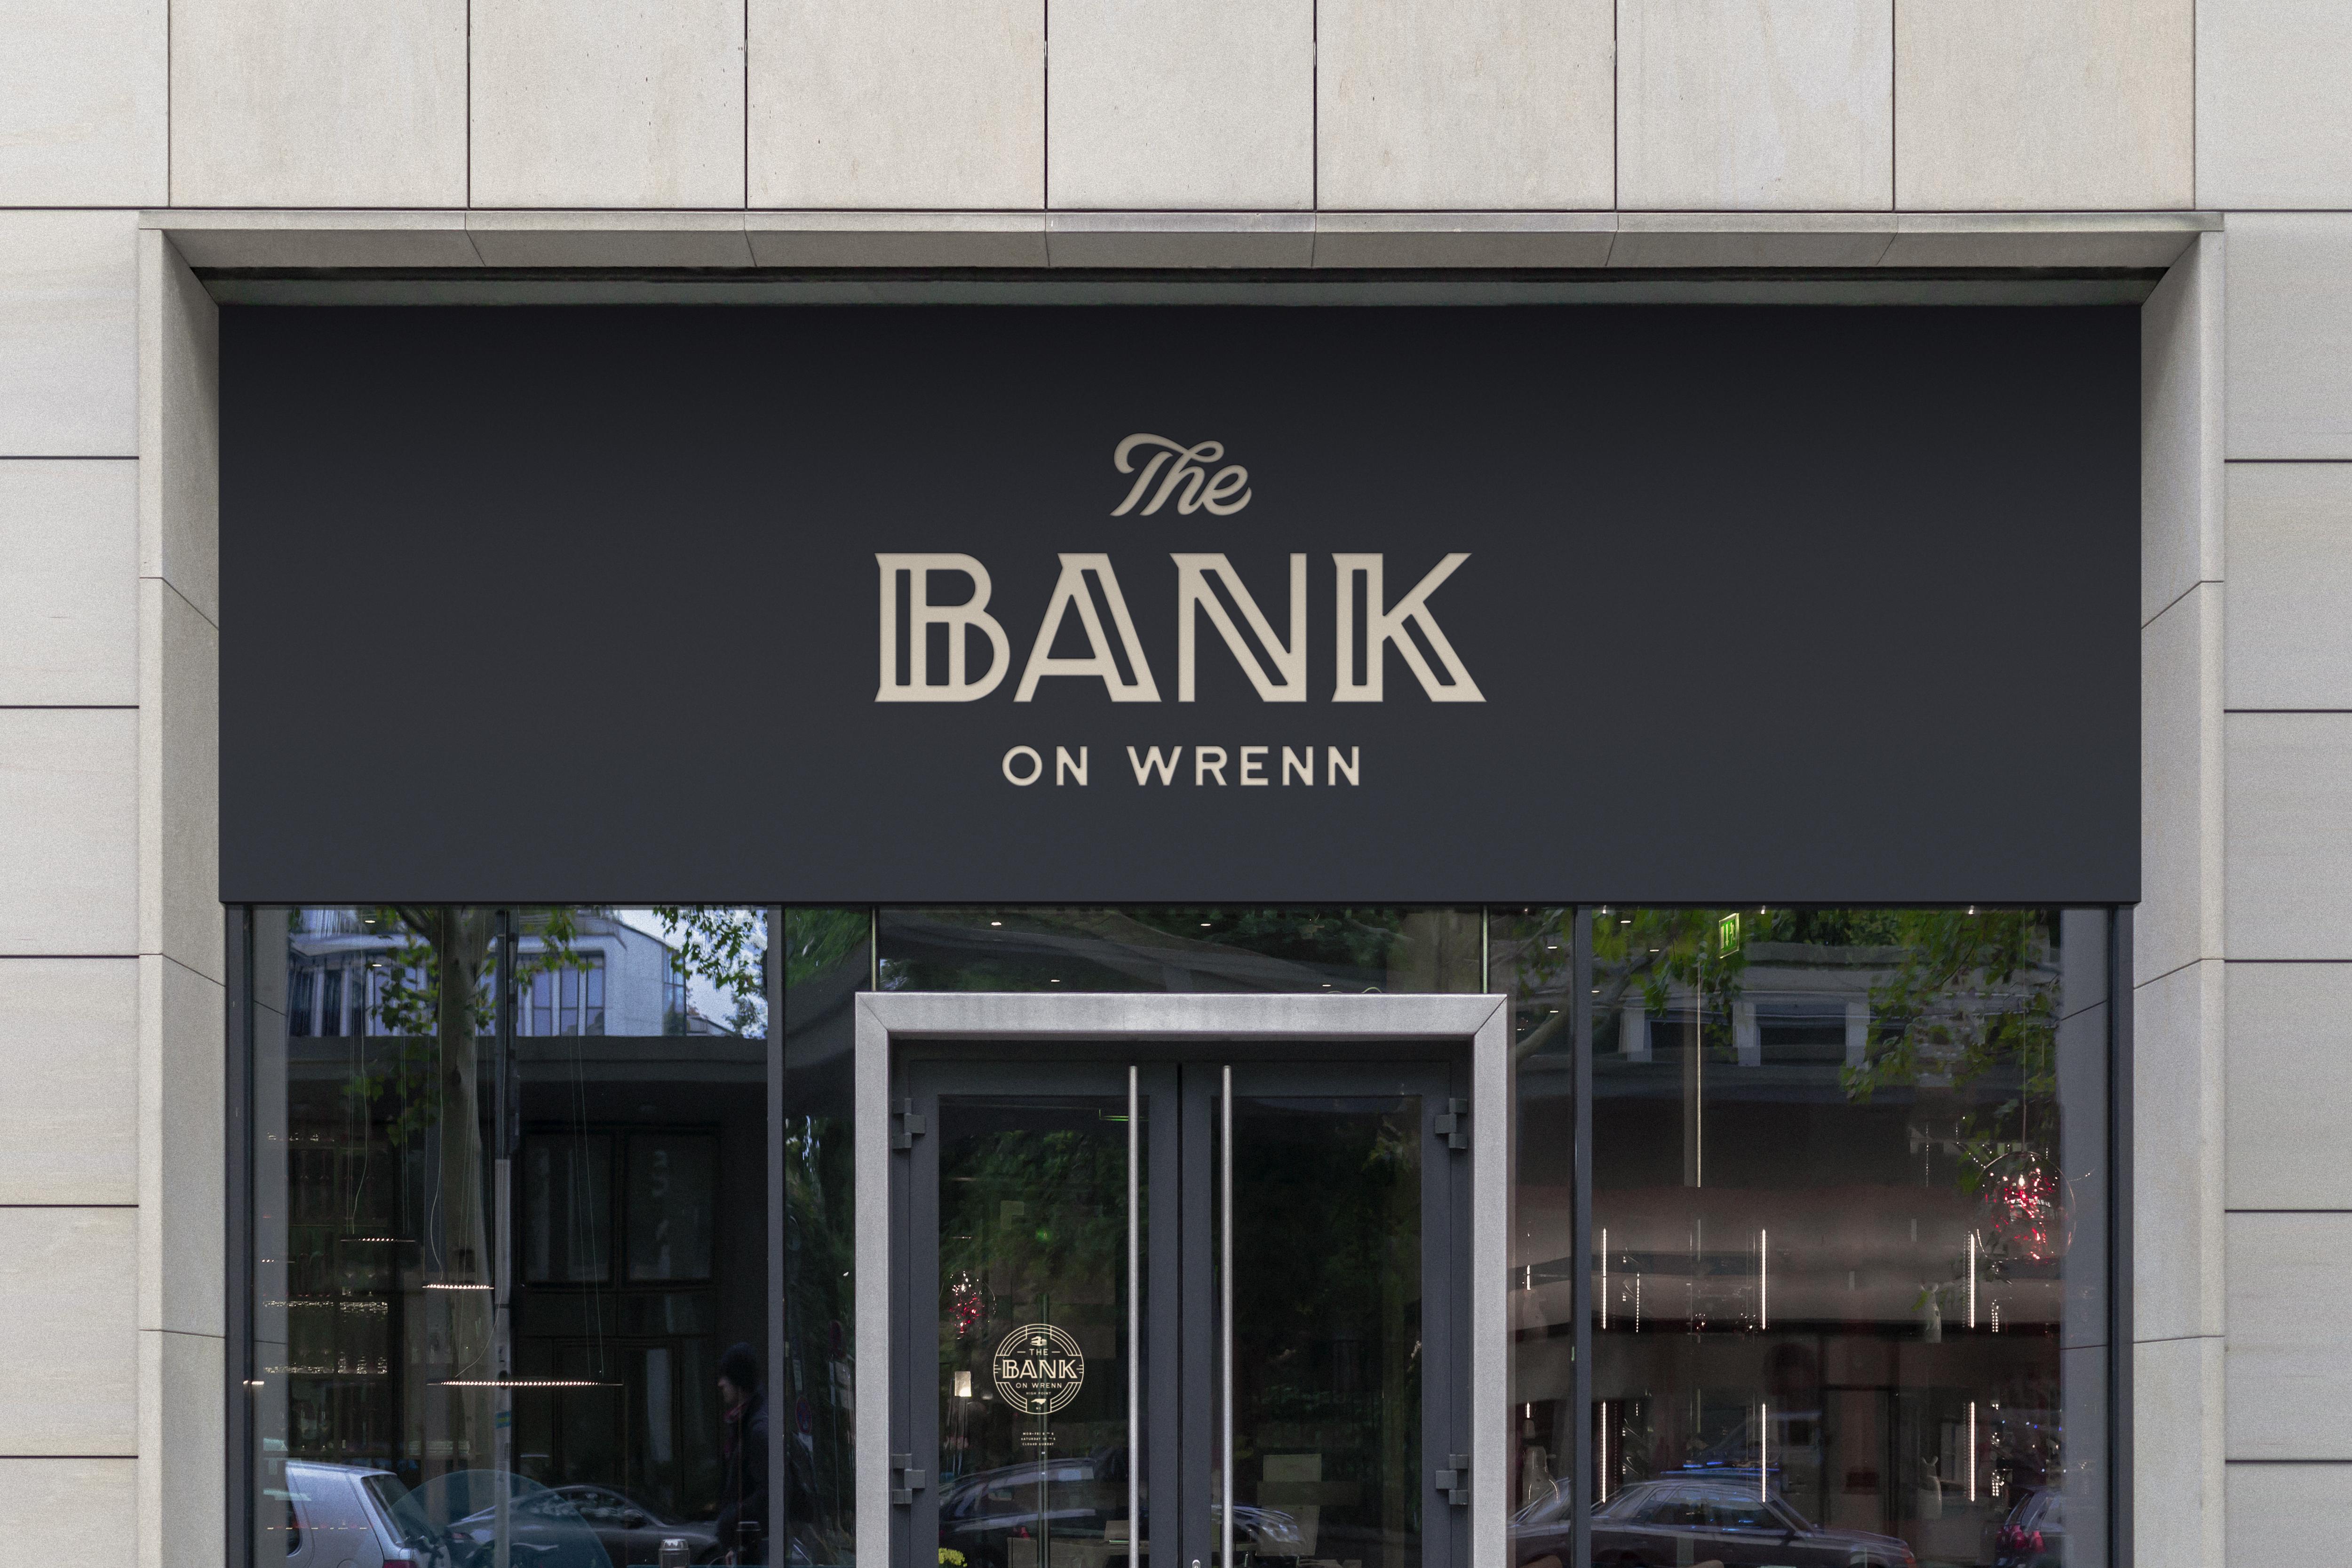 TBS_TheBank_Building_1